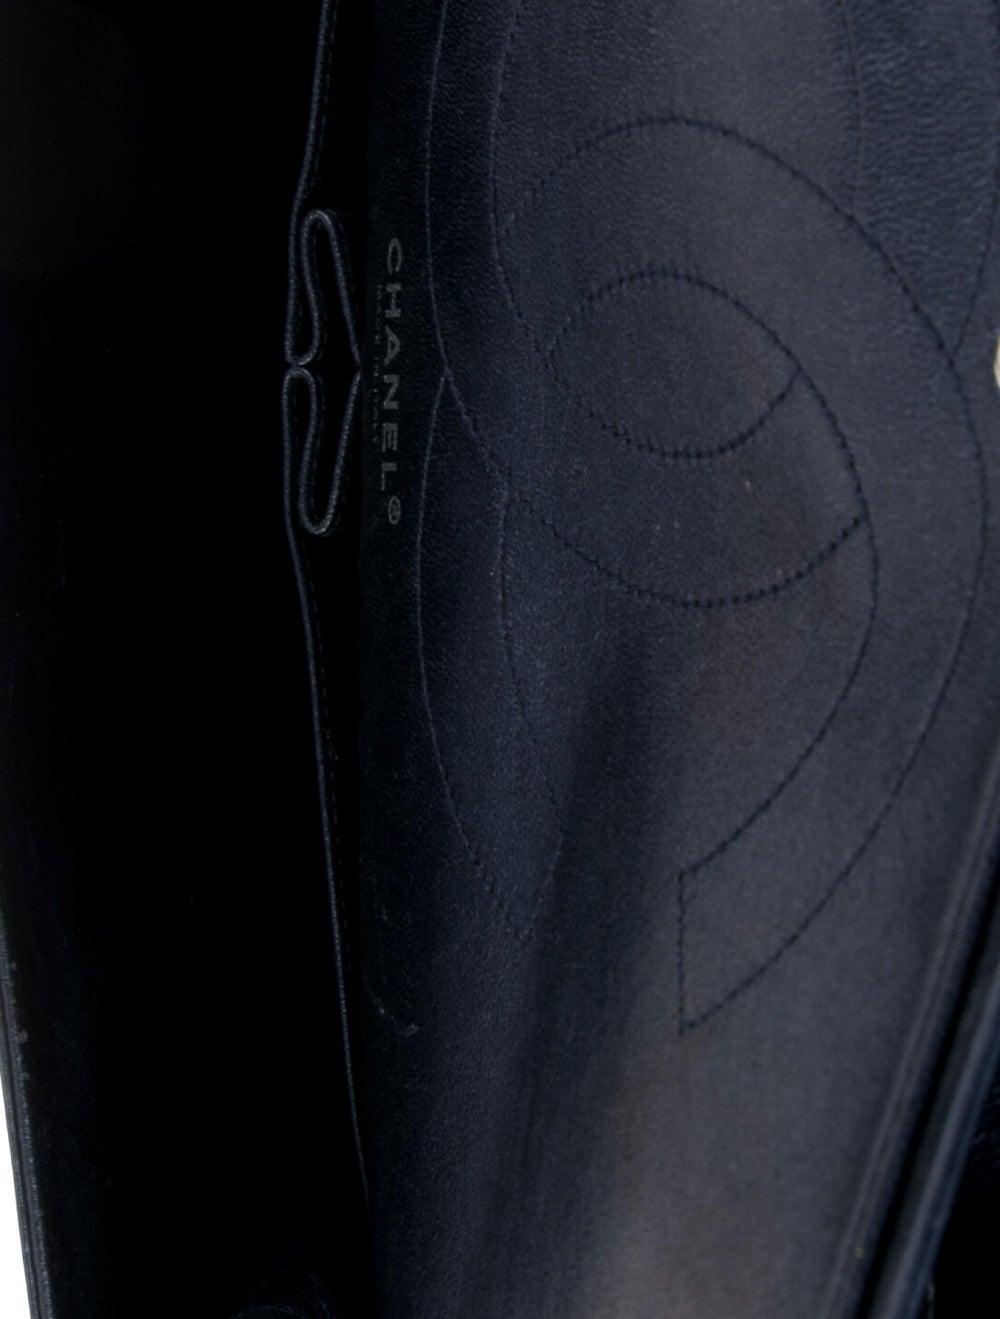 Chanel Reissue 2.55 Classic 227 Flap Bag Blue - image 5